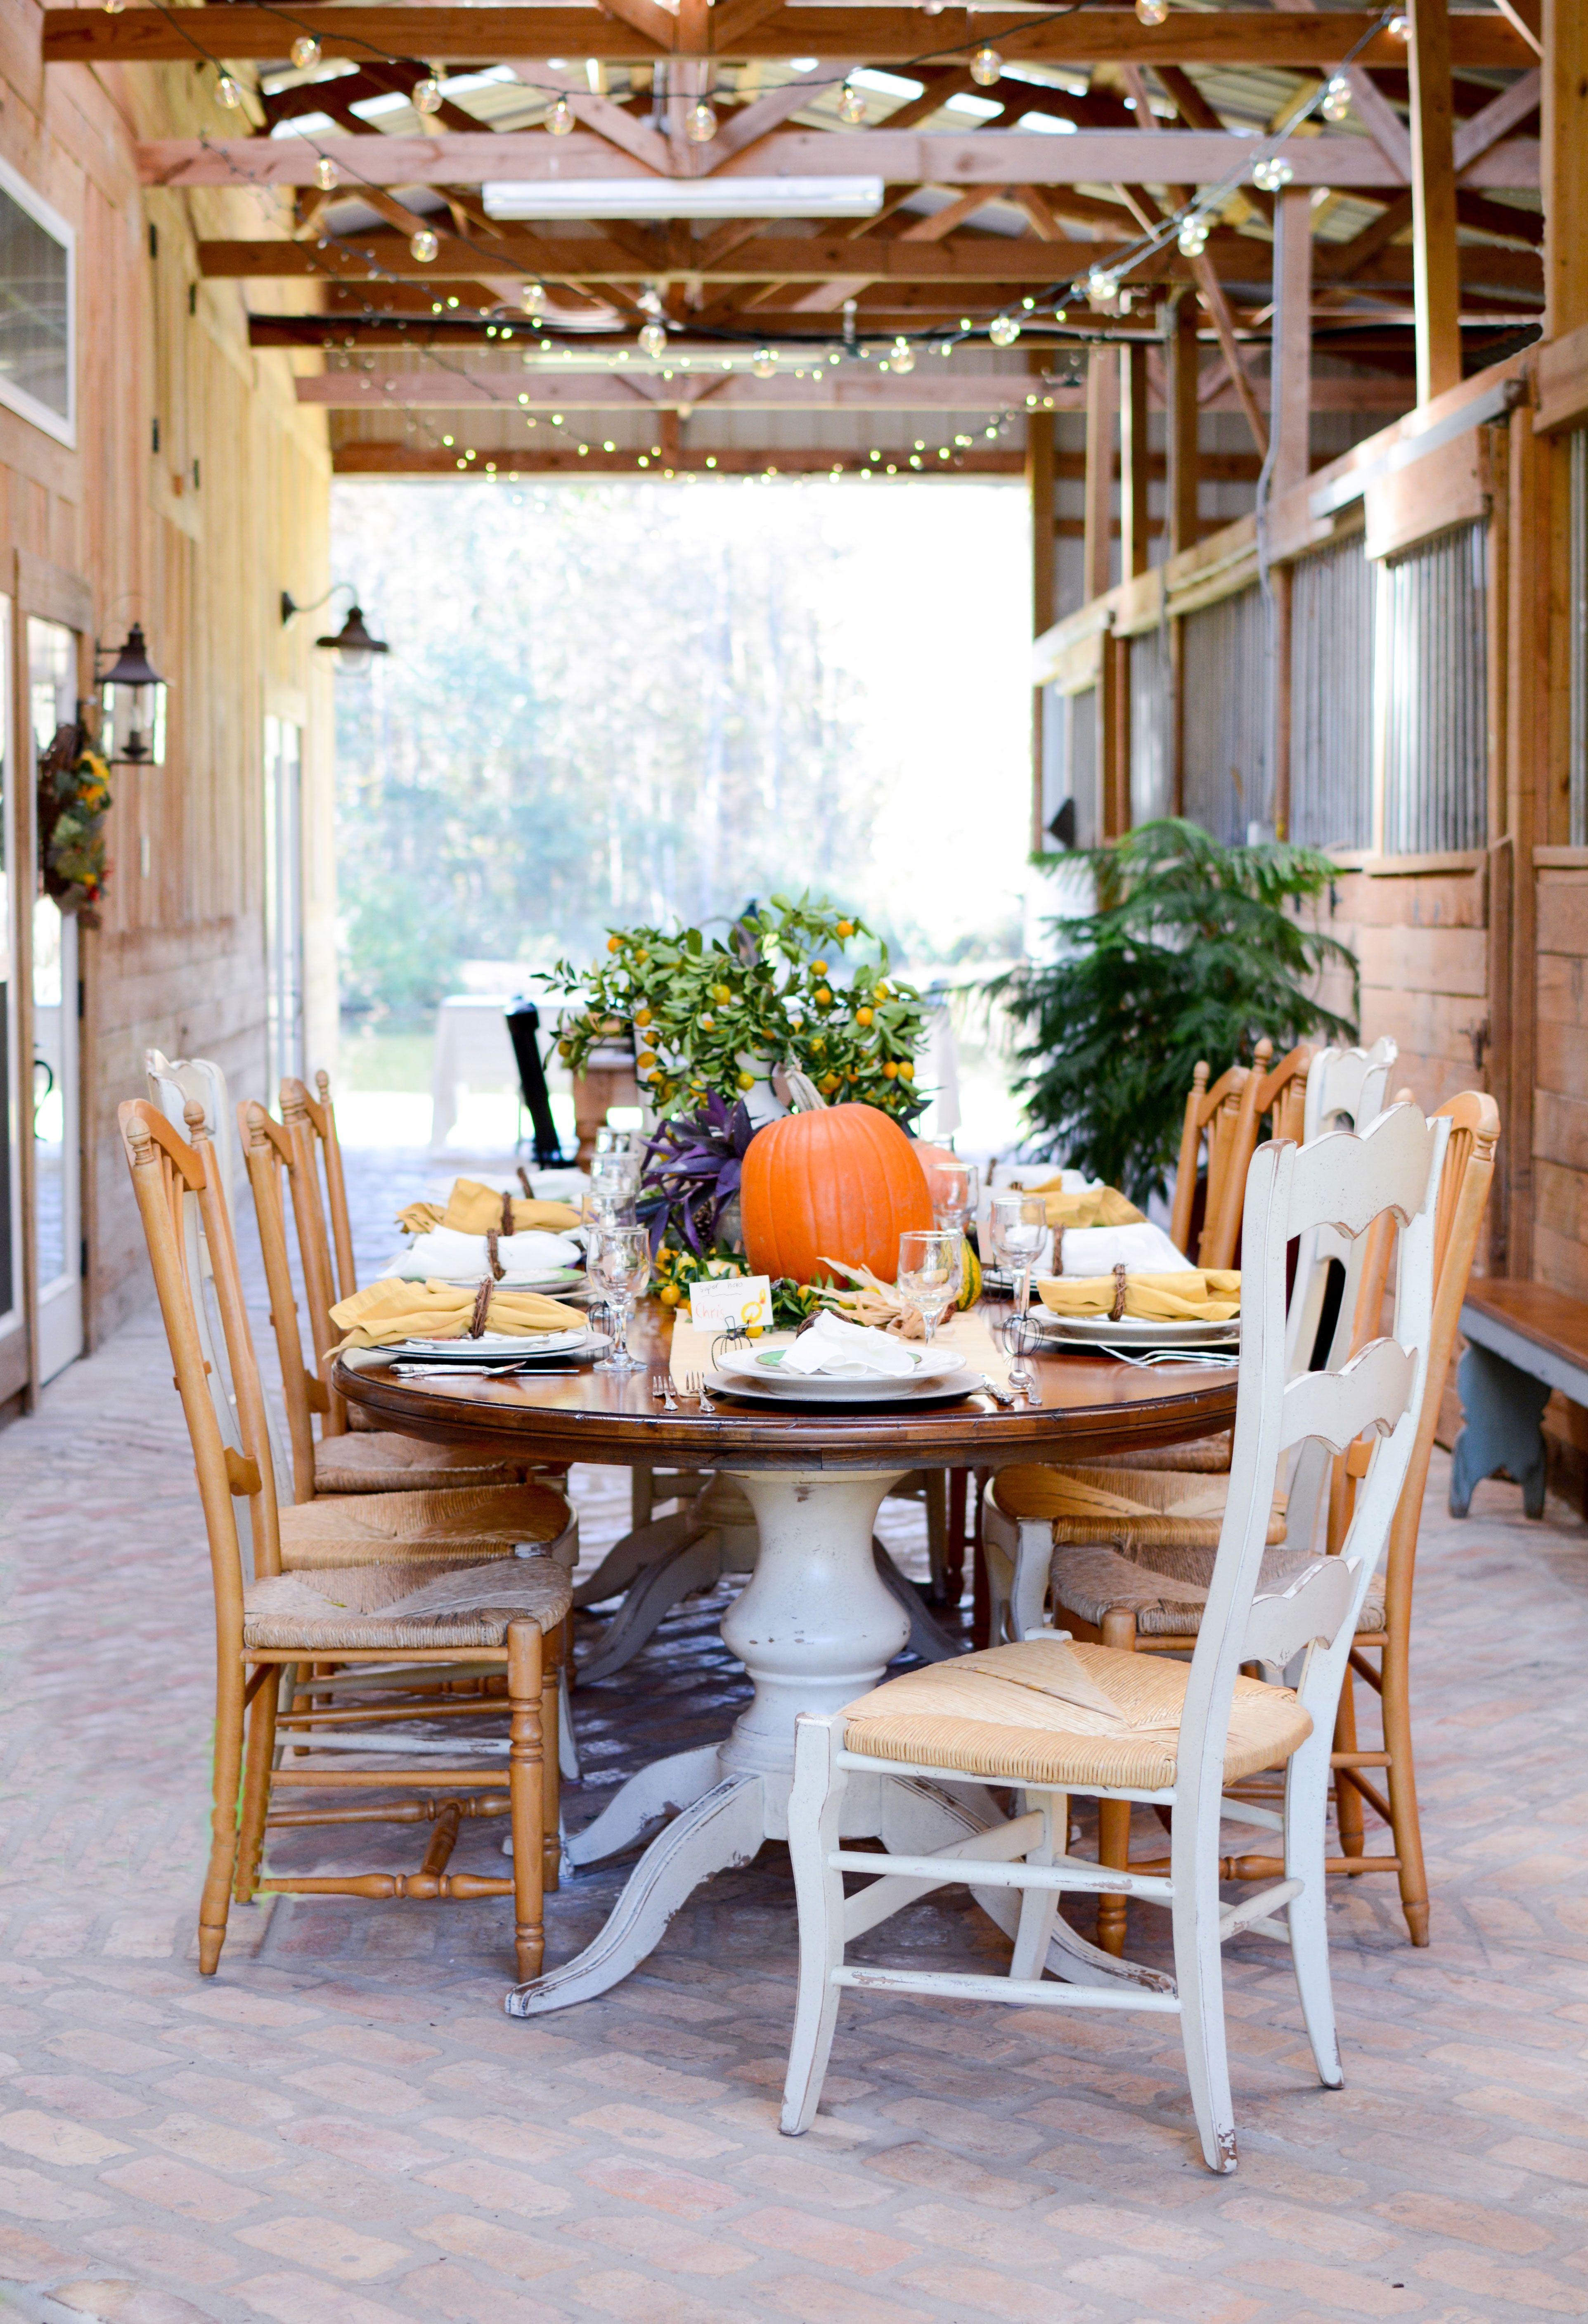 Janelle patton of lark interiors hosted thanksgiving